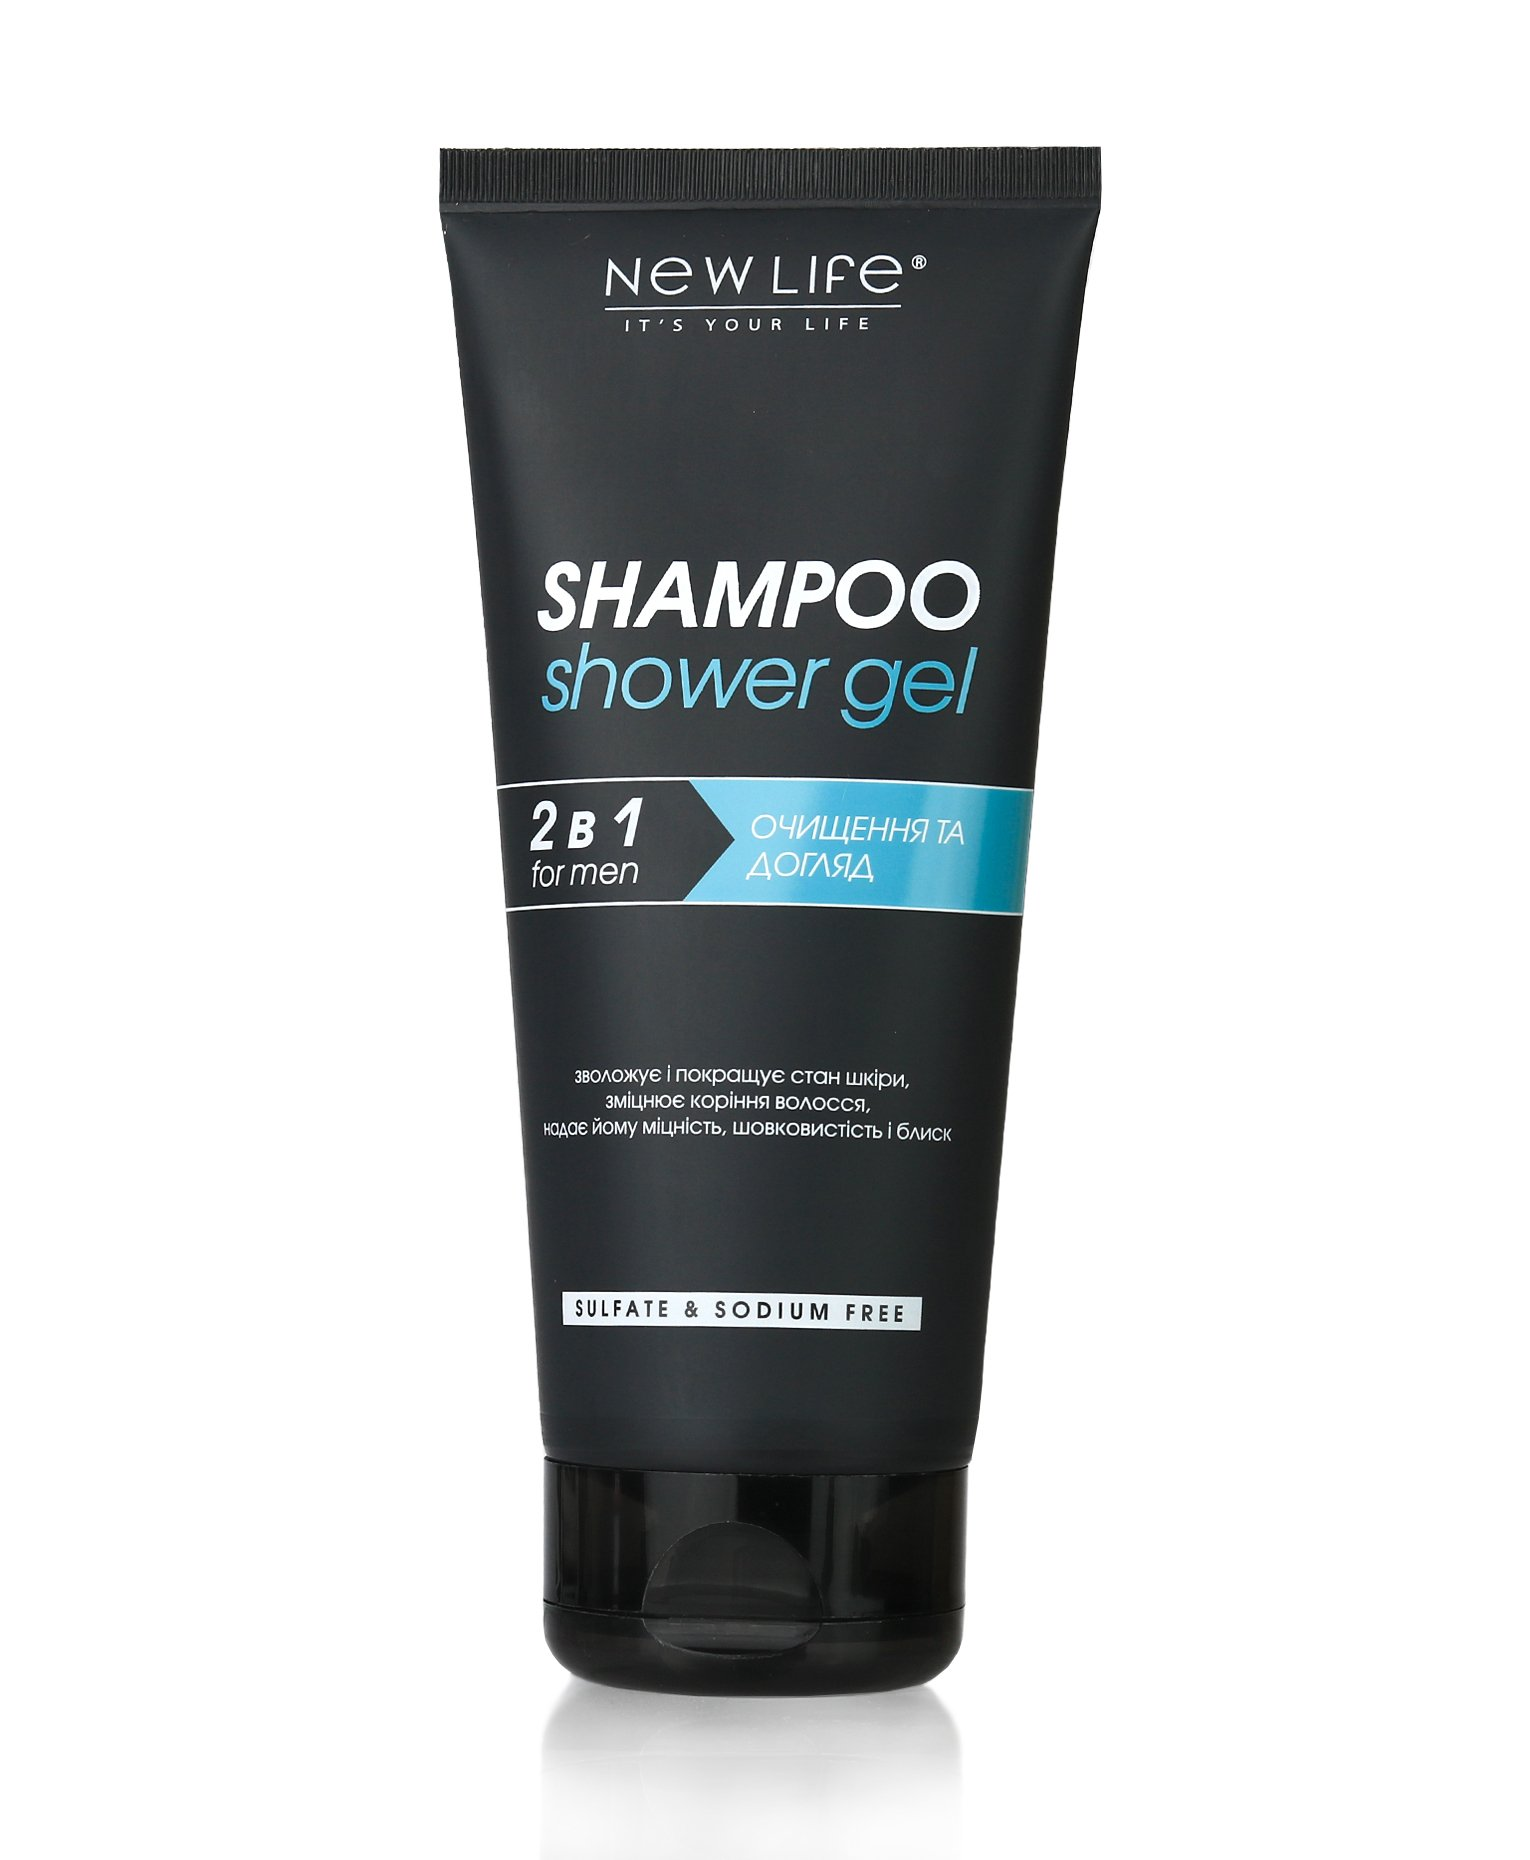 SHAMPOO SHOWER GEL 2 IN 1 FOR MEN